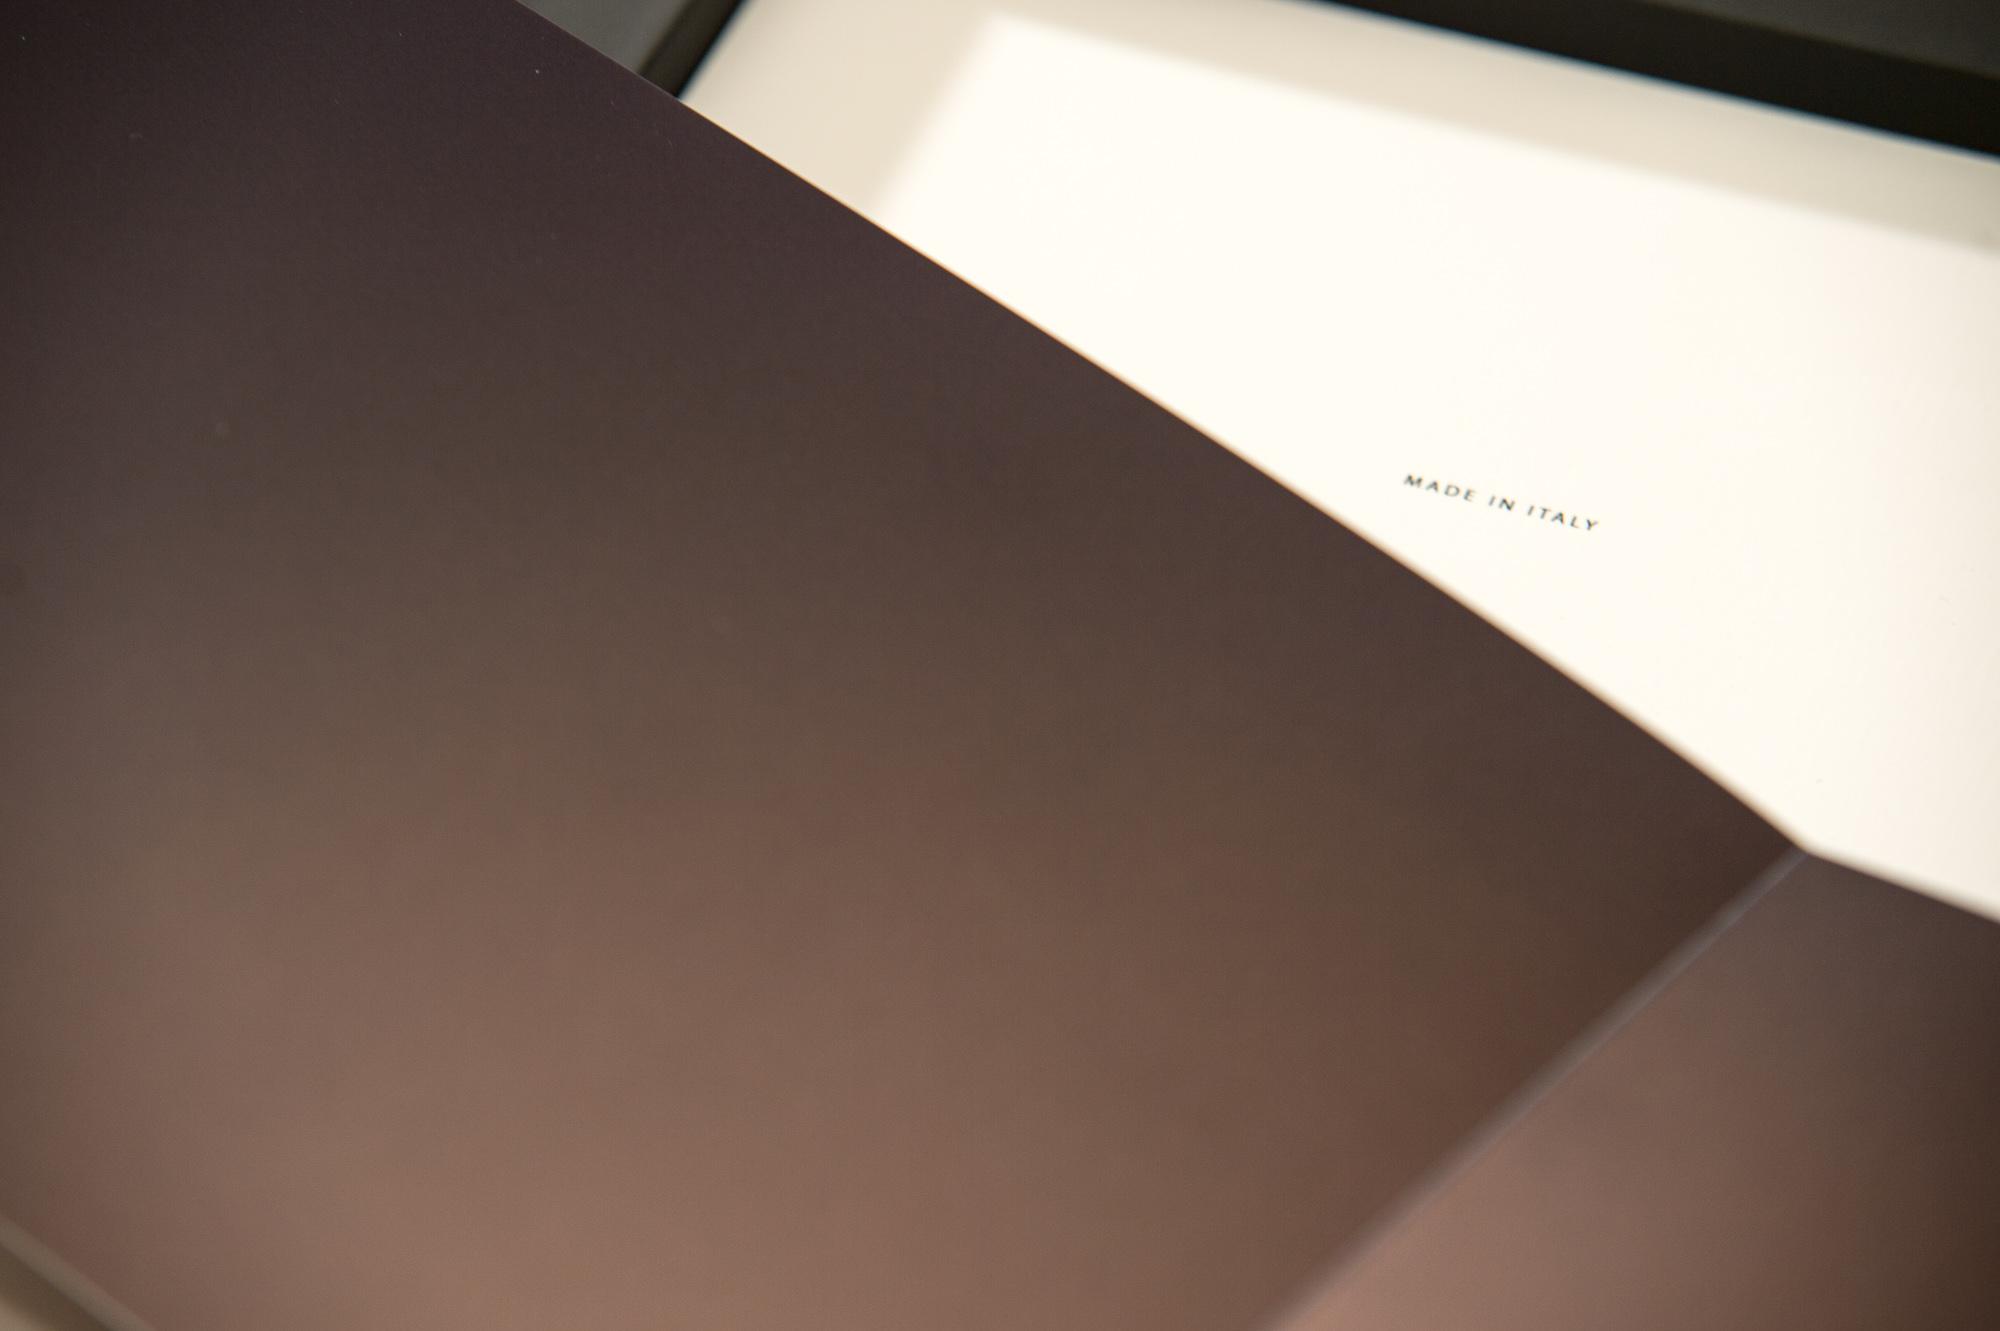 Fotobuch YoungBook B2000 6 - Fotobücher